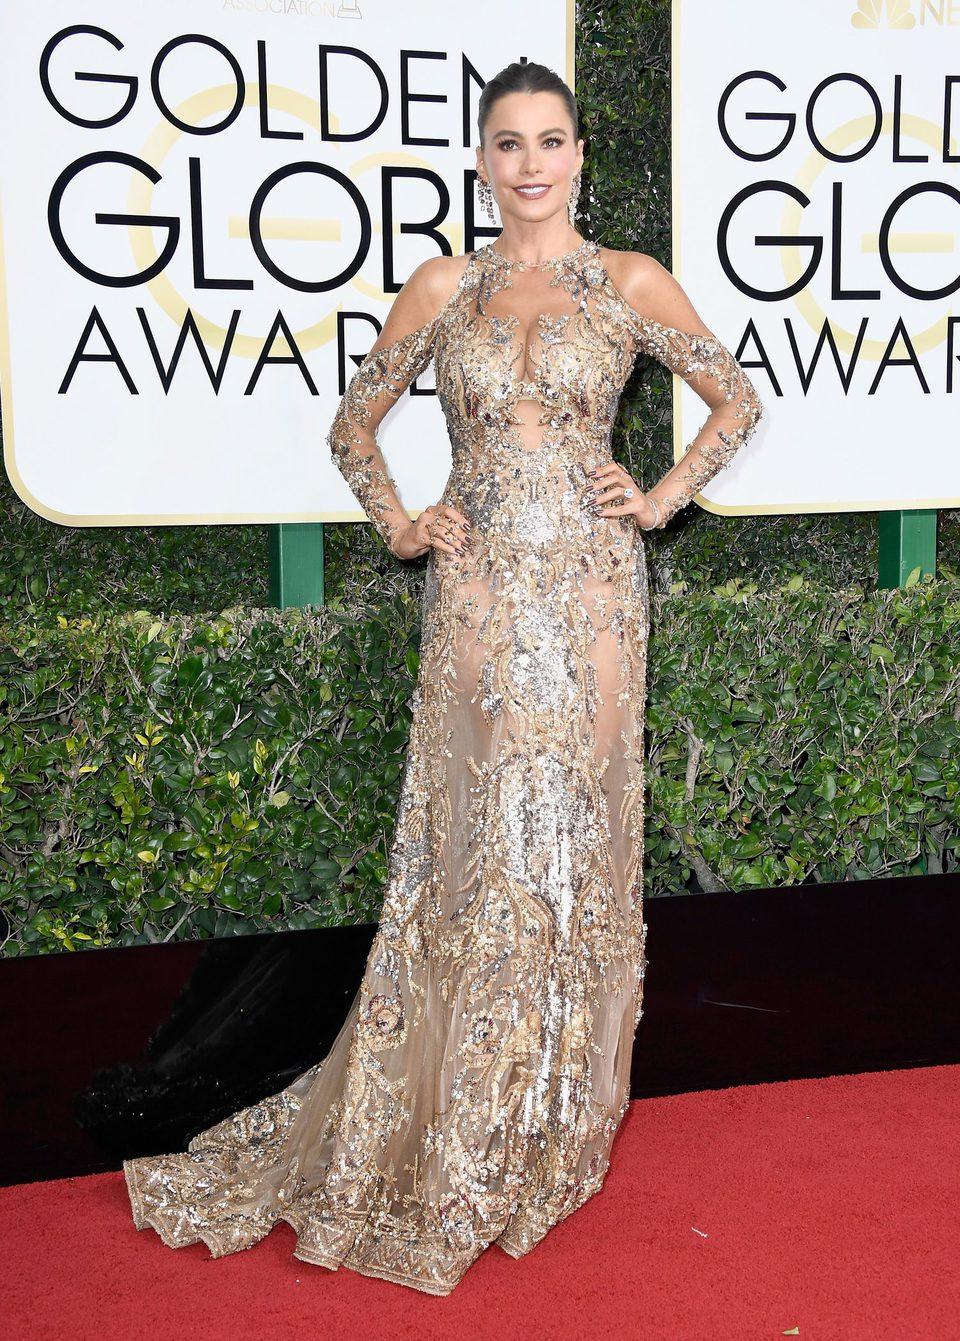 Sofia Vergara at Golden Globes 2017 red carpet